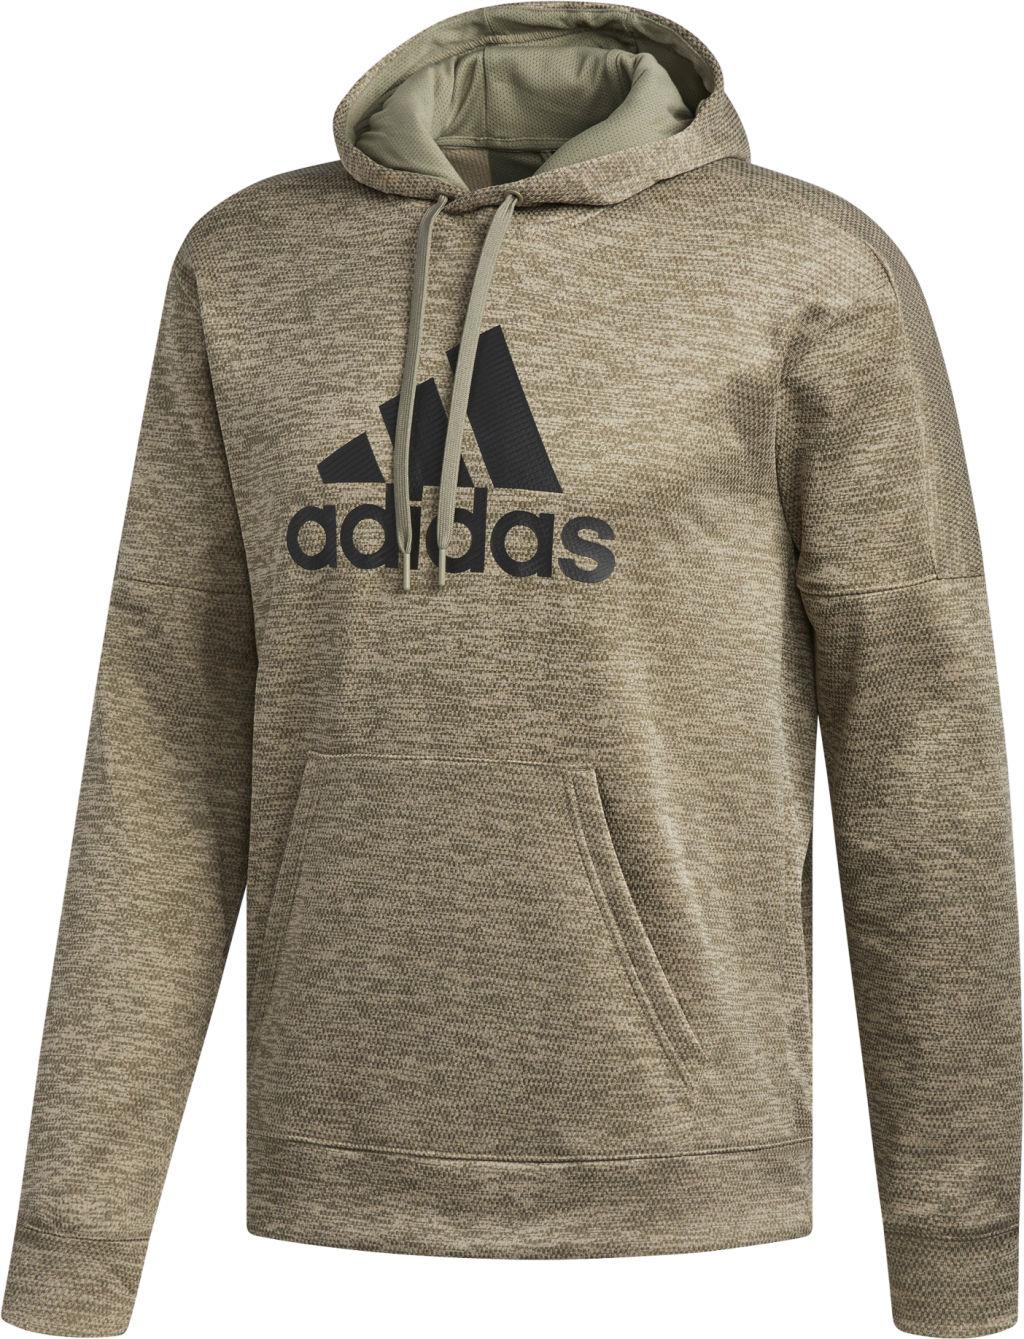 Adidas Ti Flc Poh Logo miesten huppari Harmaa cbcdce9031